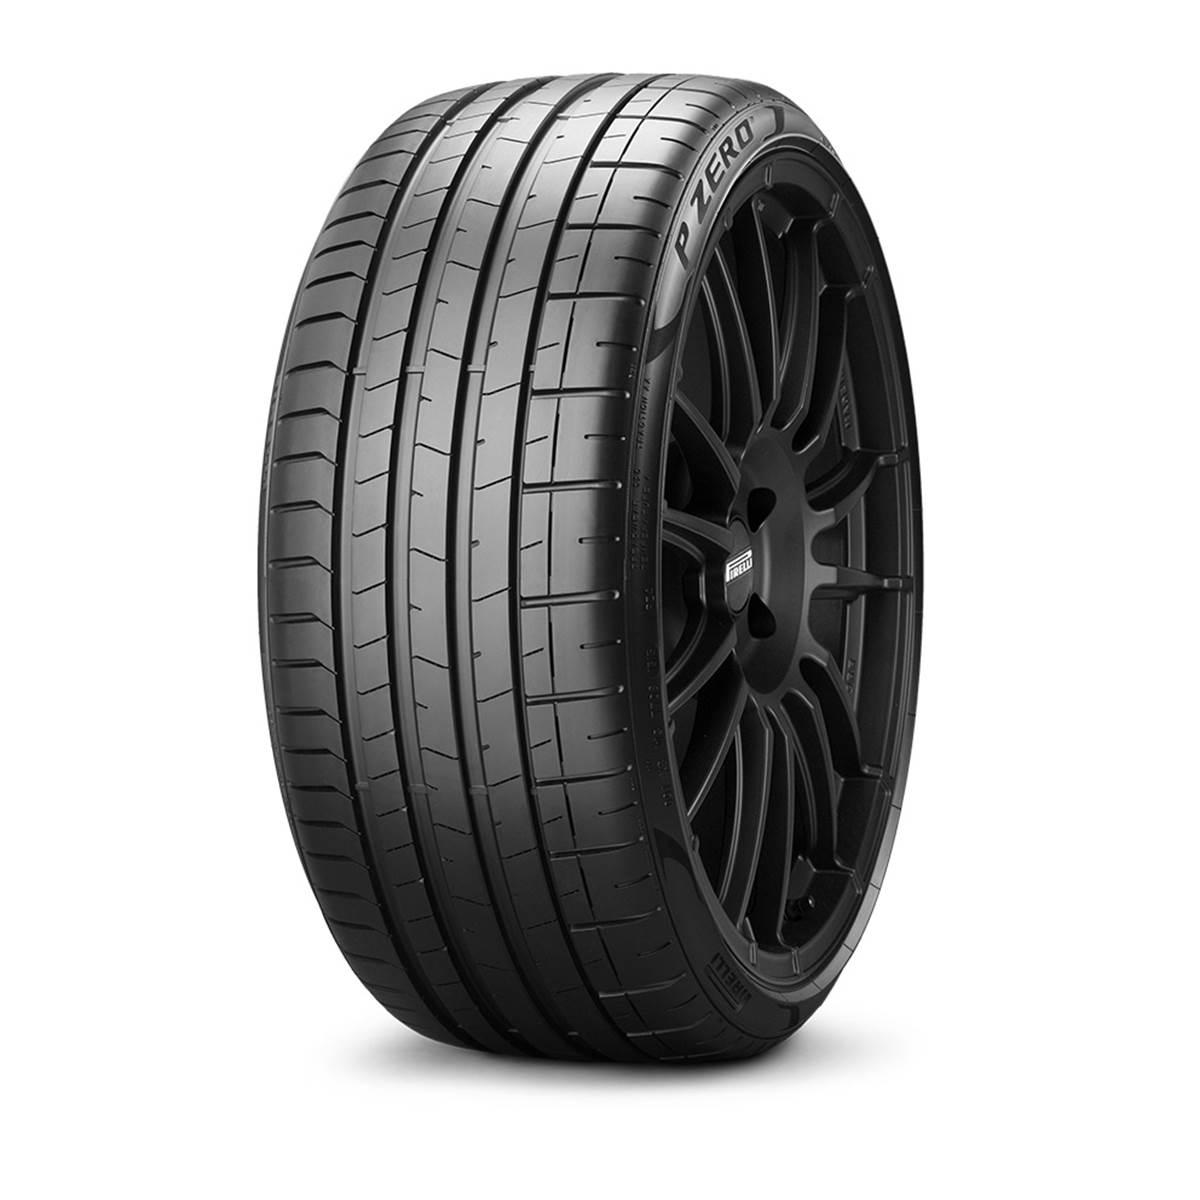 Pneu Pirelli 285/30R20 99Y P-Zero